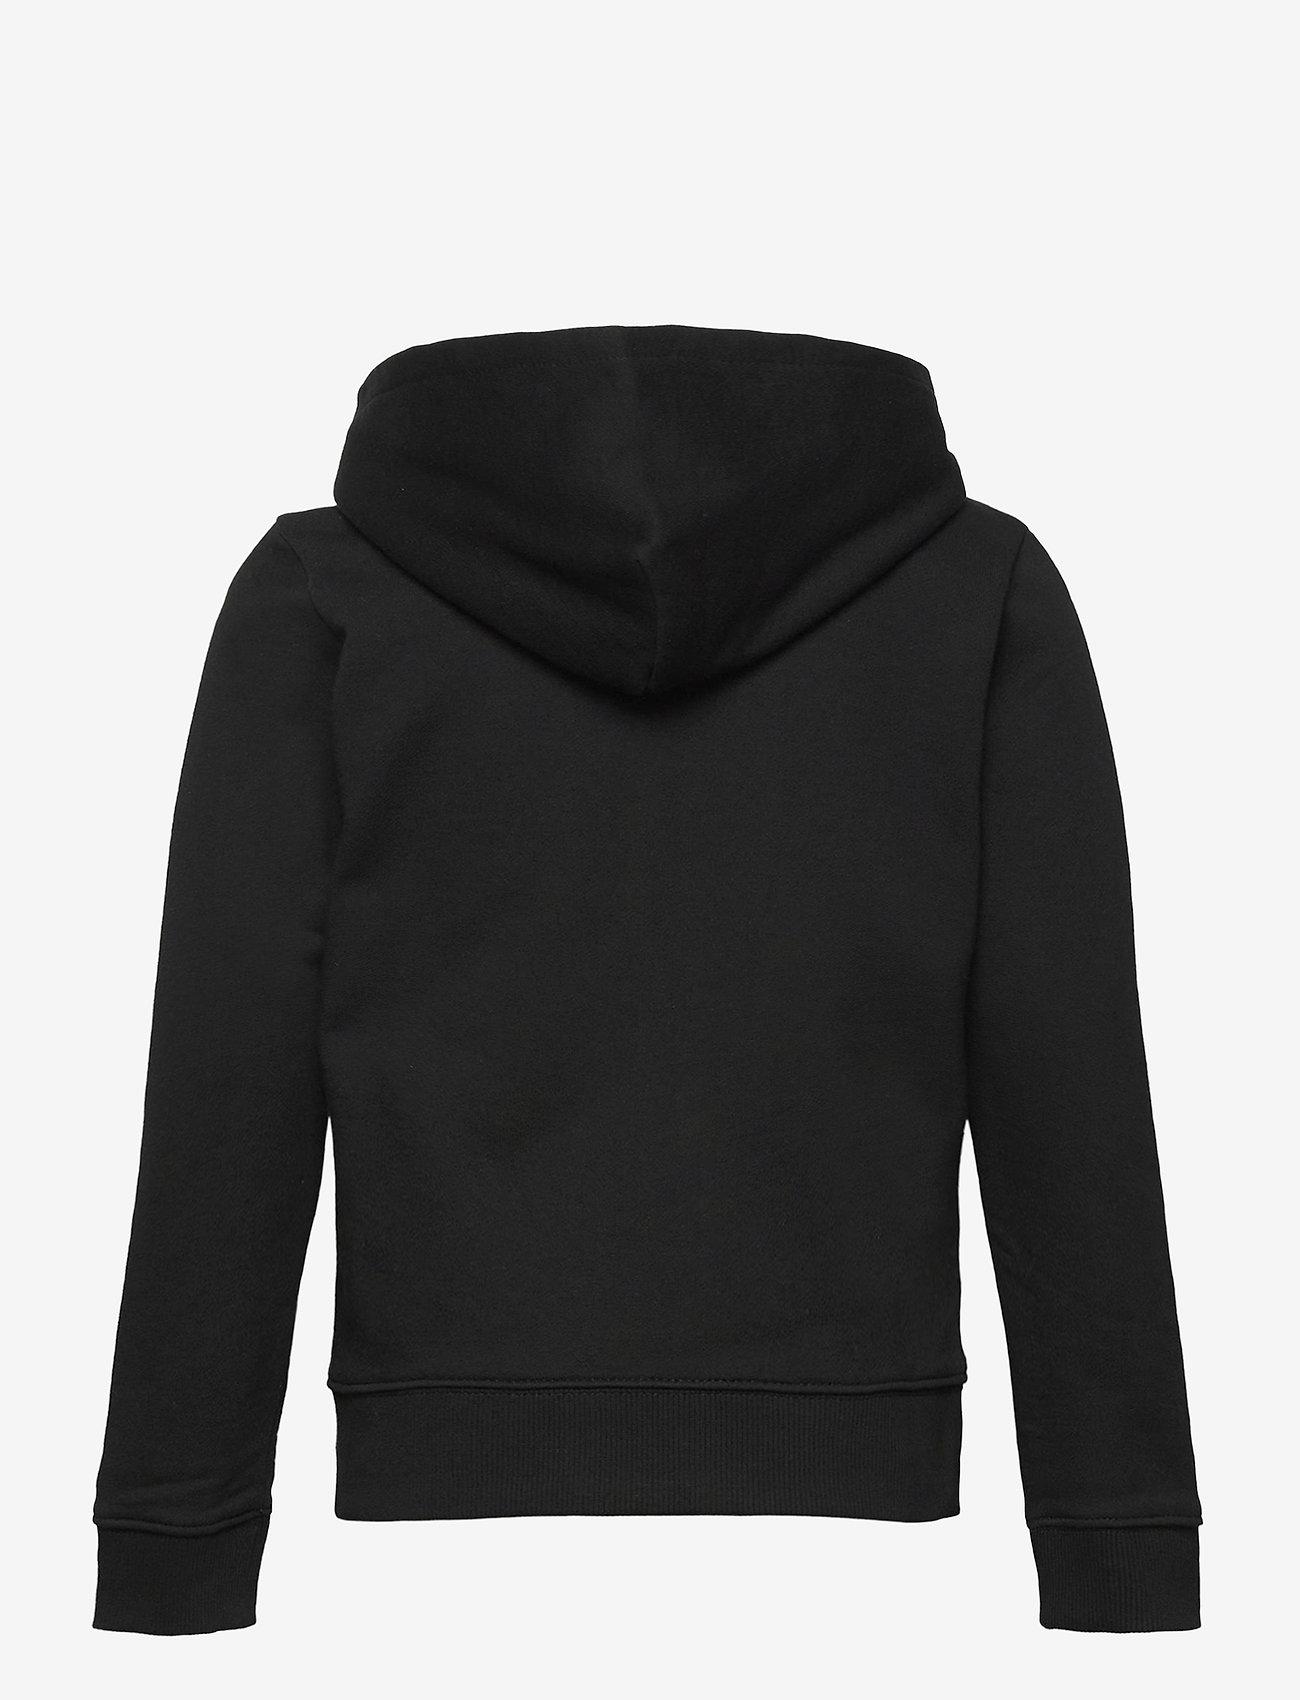 Calvin Klein - HYBRID LOGO ZIP THROUGH - kapuzenpullover - ck black - 1